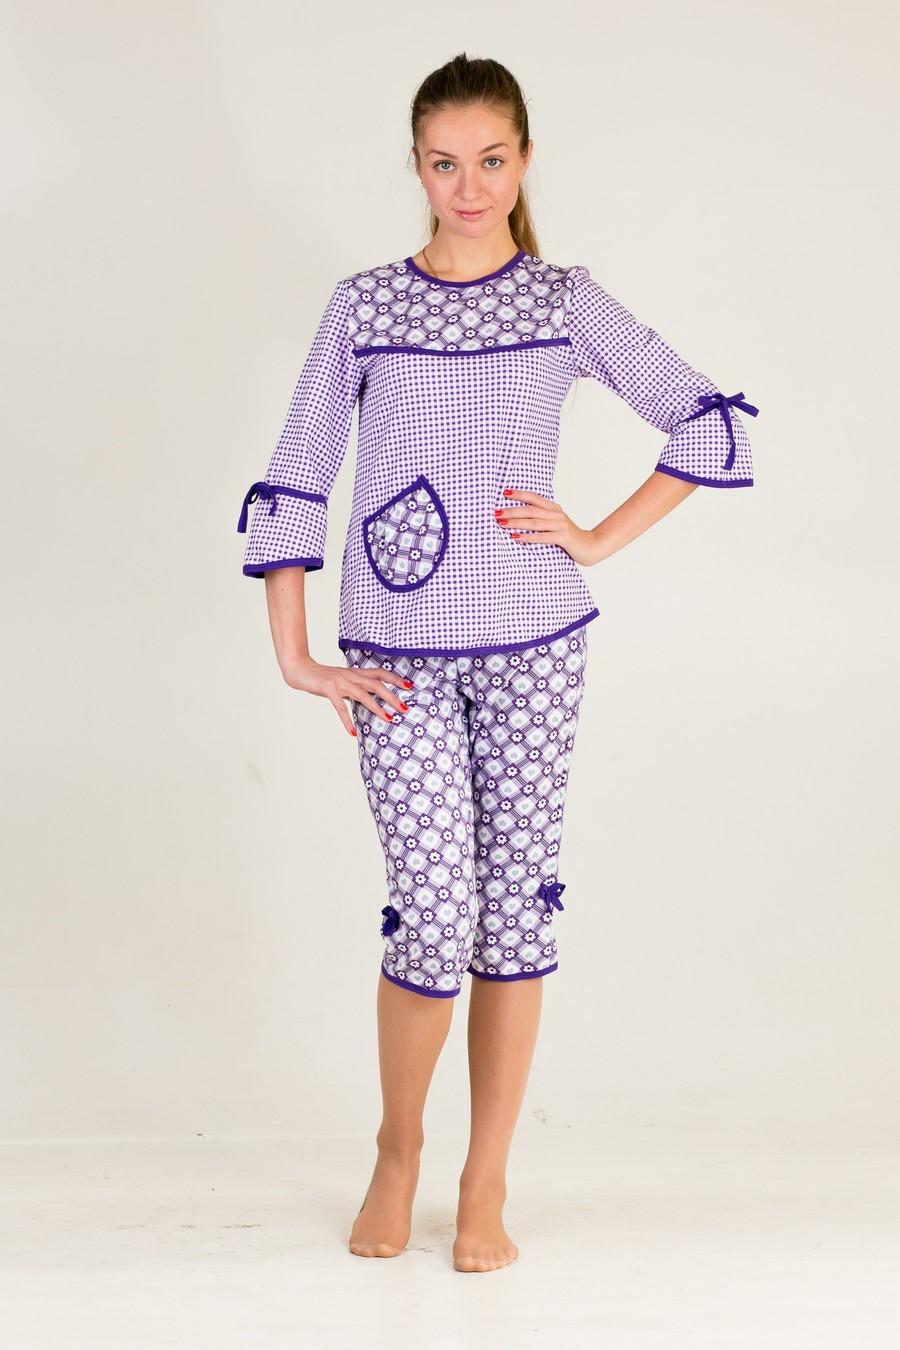 Пижама Катя Фиолет кофта+бриджиДомашняя одежда<br><br><br>Размер: 58